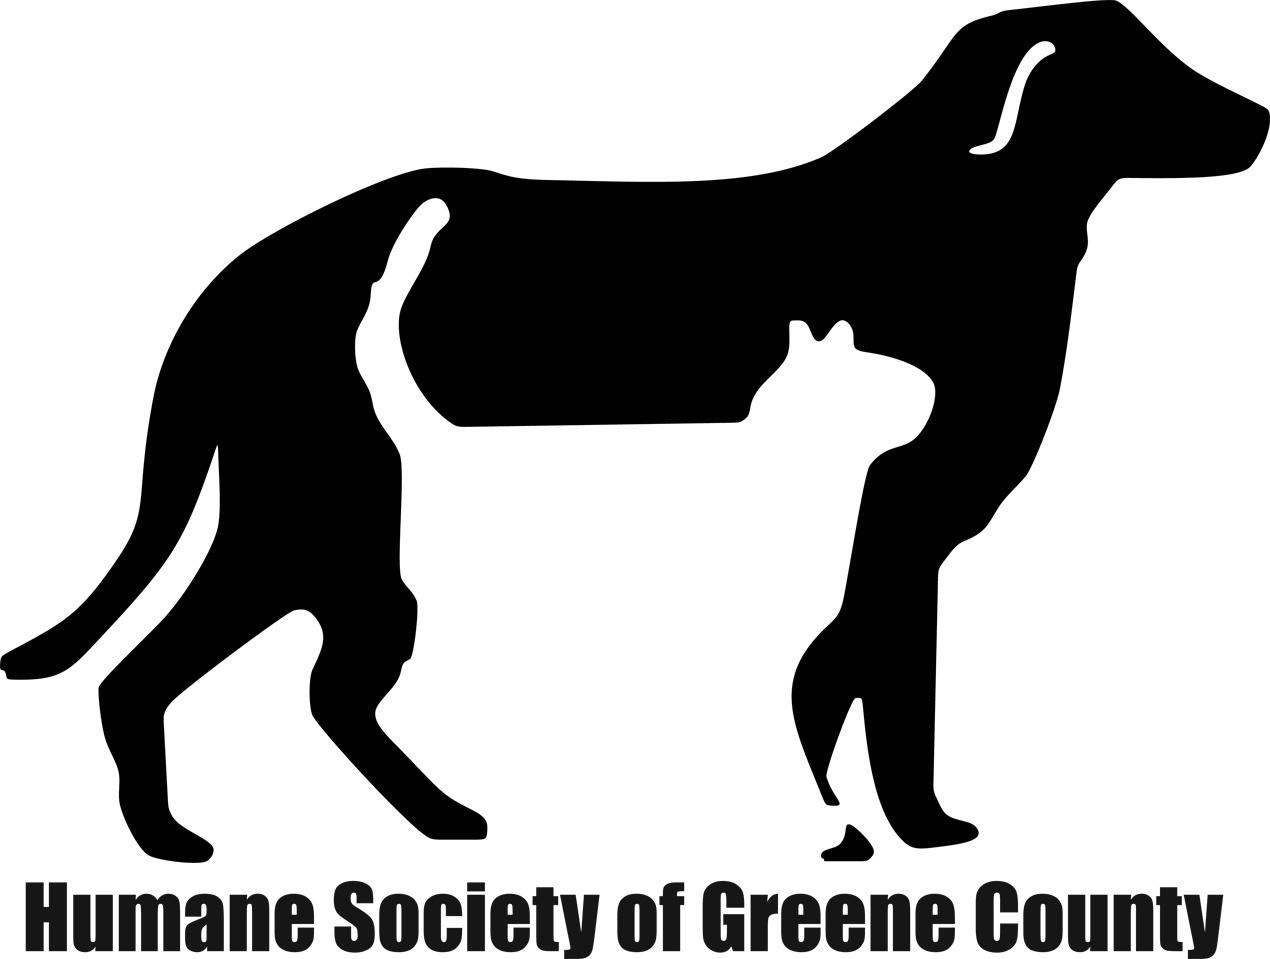 Humane Society of Greene County